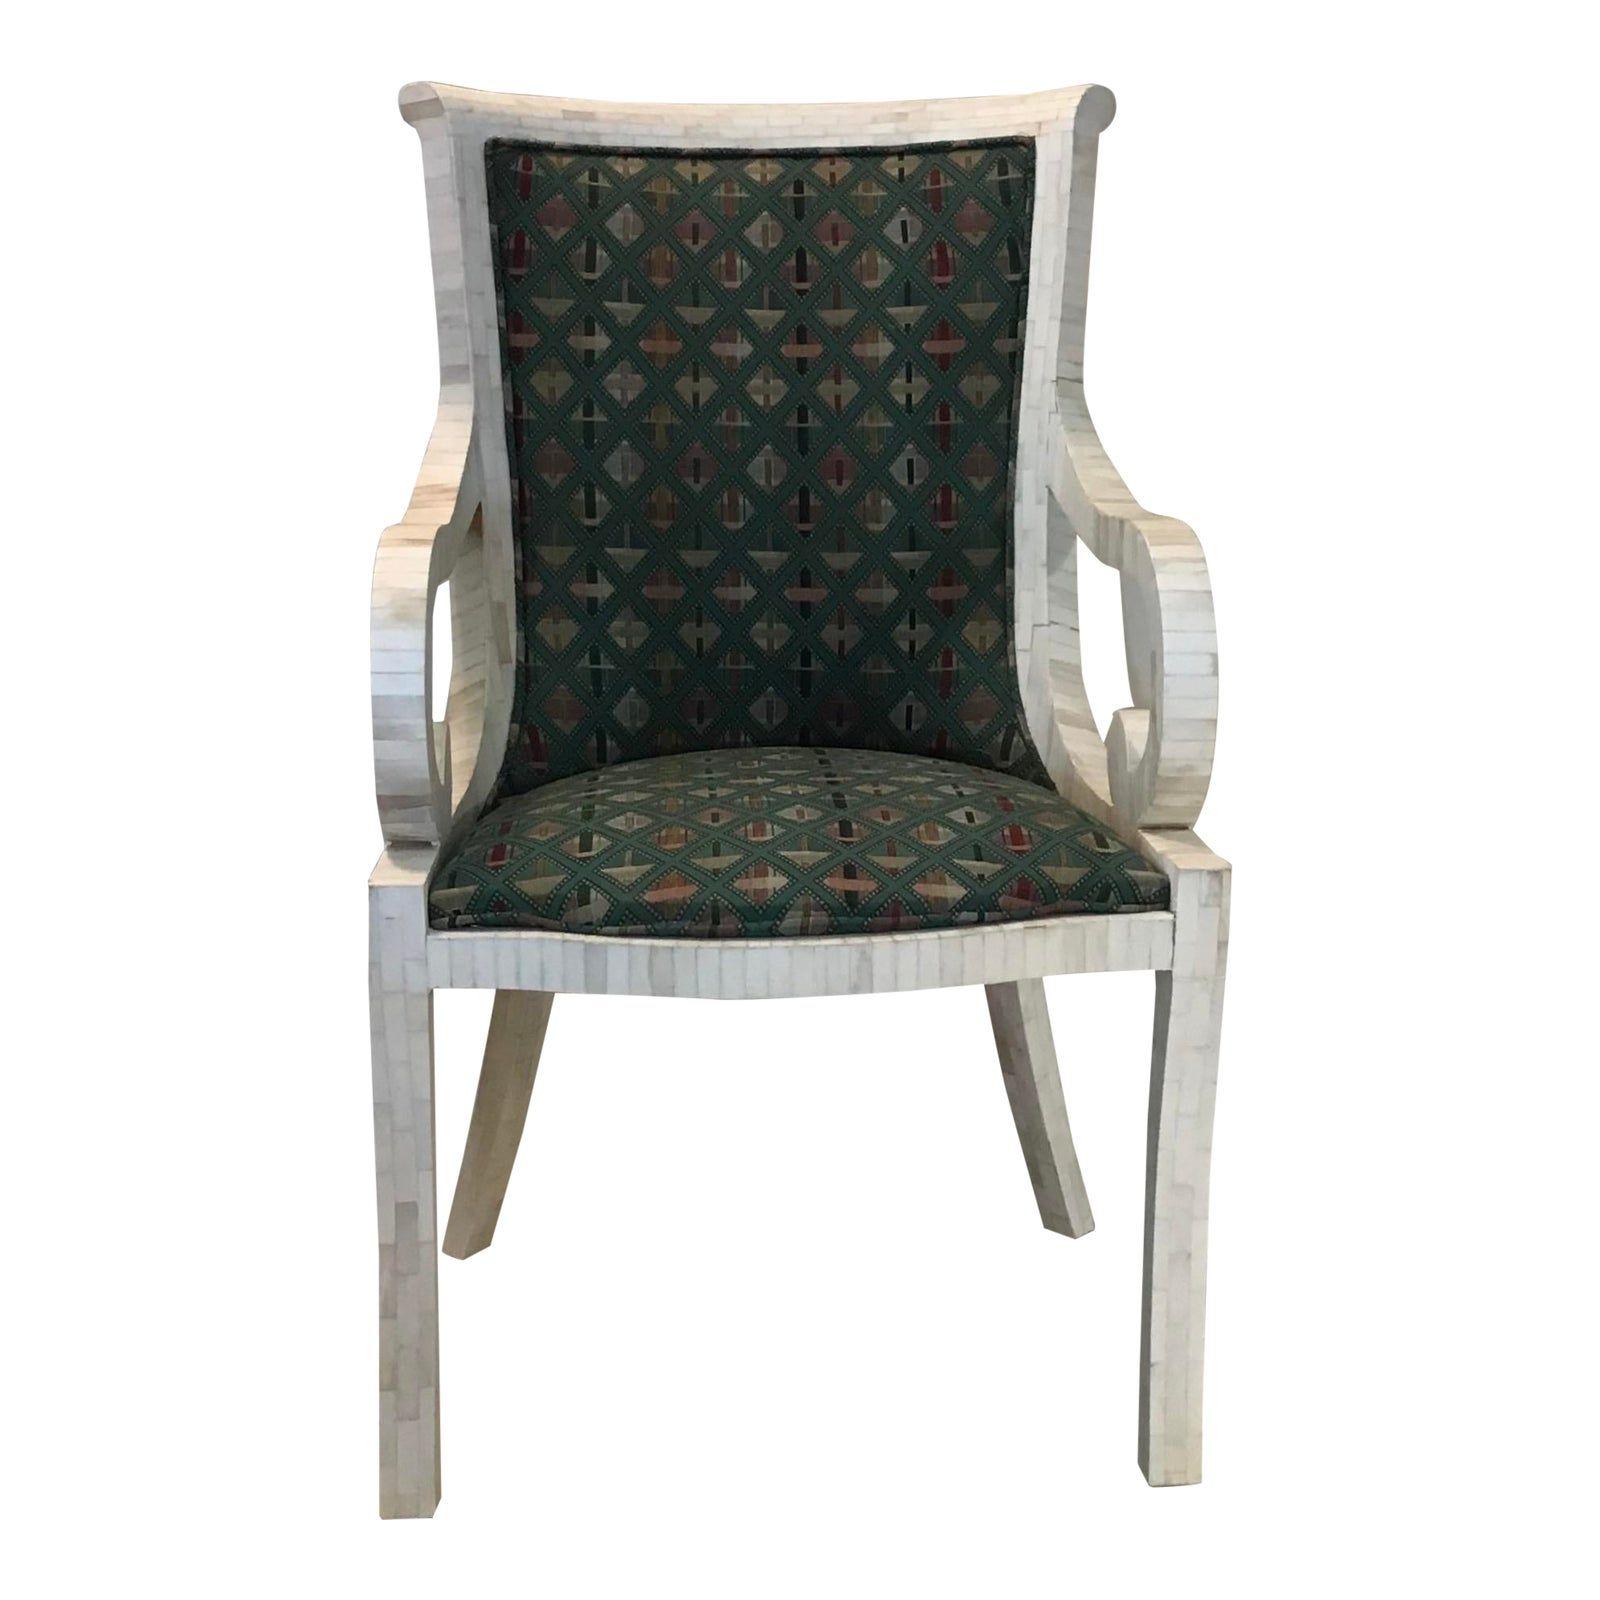 Vintage 1970s Enrique Garcel For Karl Springer White Bone Tile Arm Chair In 2020 Armchair Design Chair Armchair